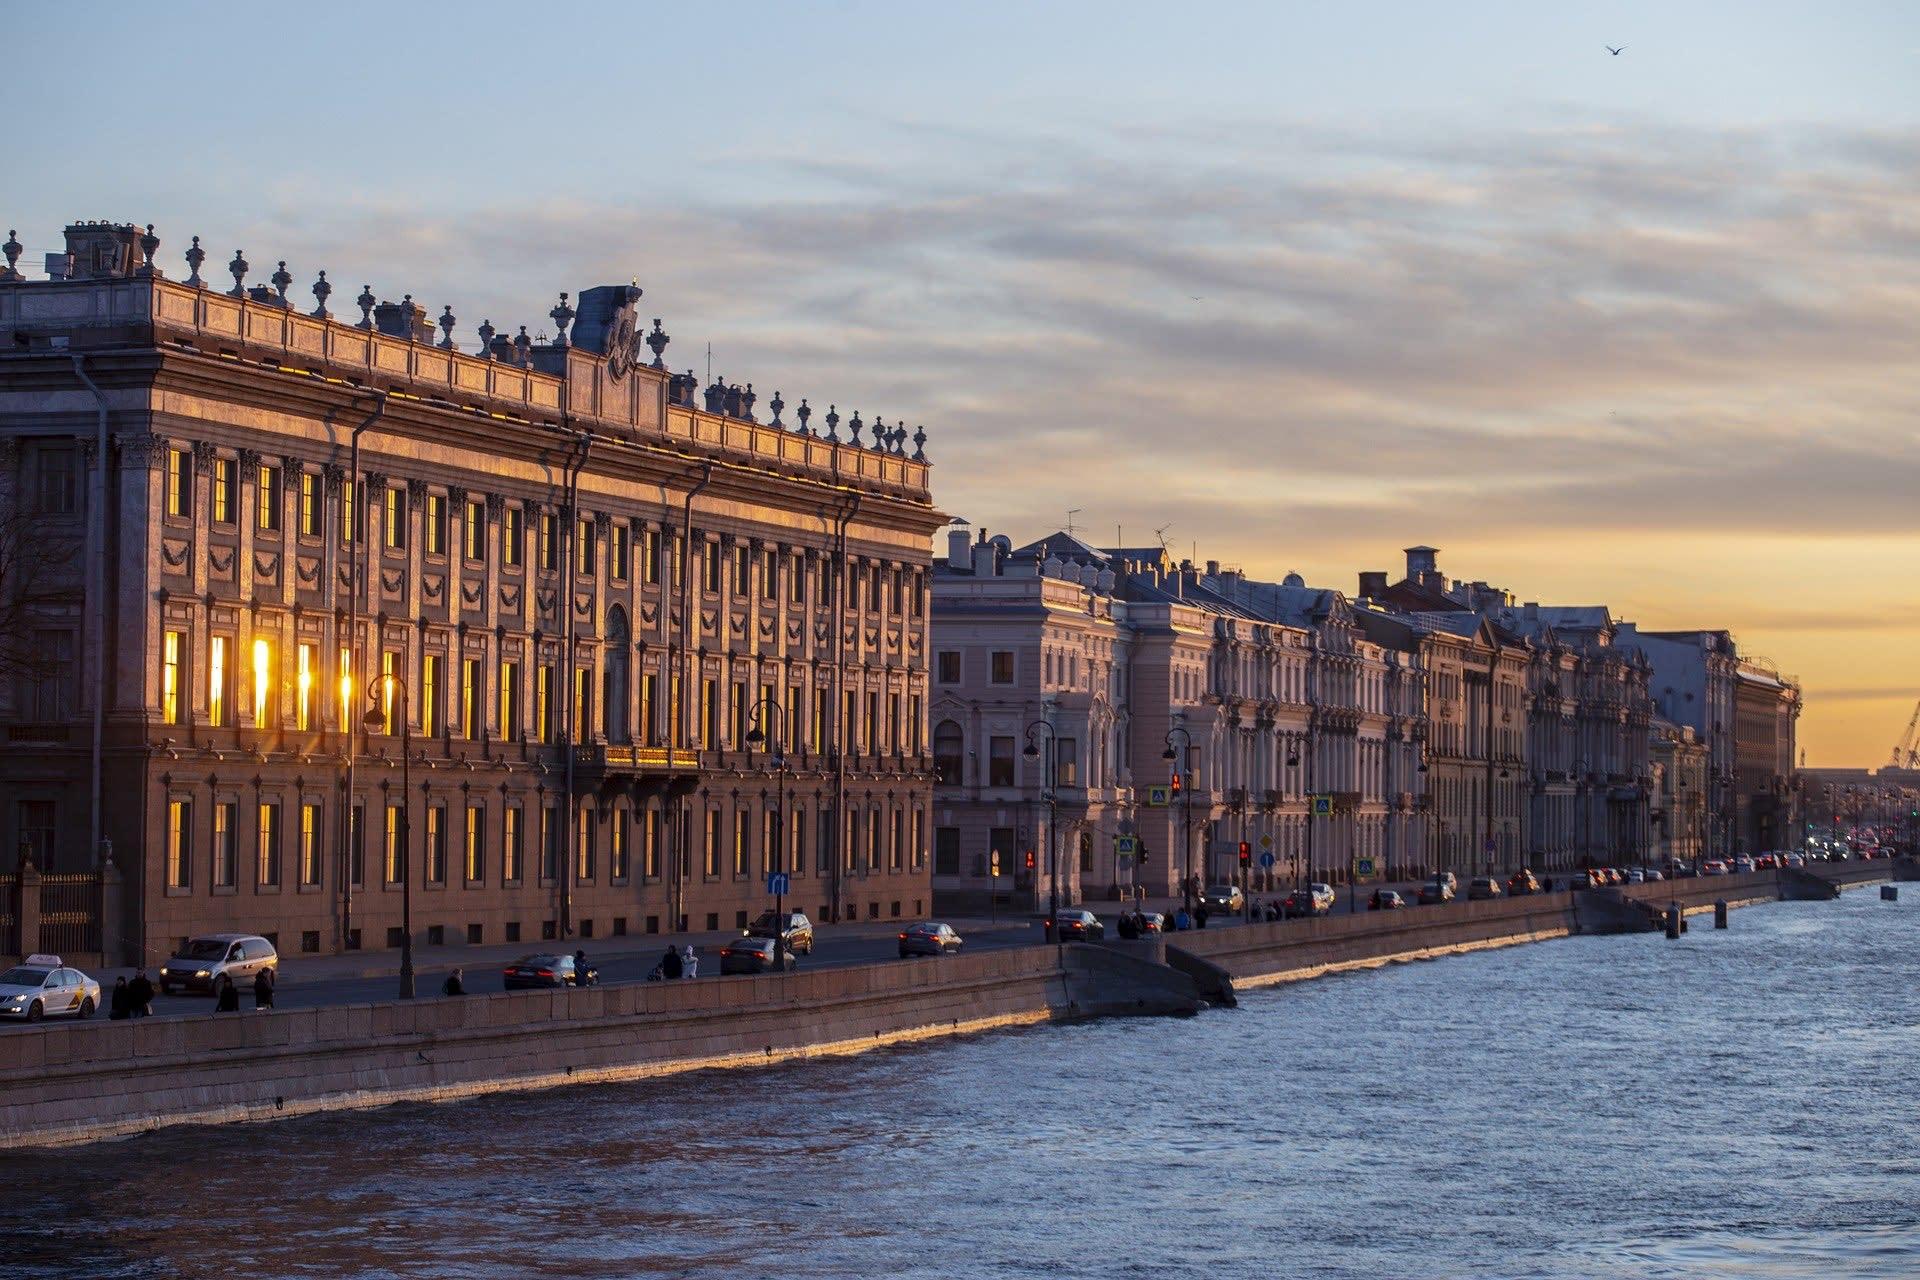 Saint Petersburg - Revolution Series: Between the Two Revolutions